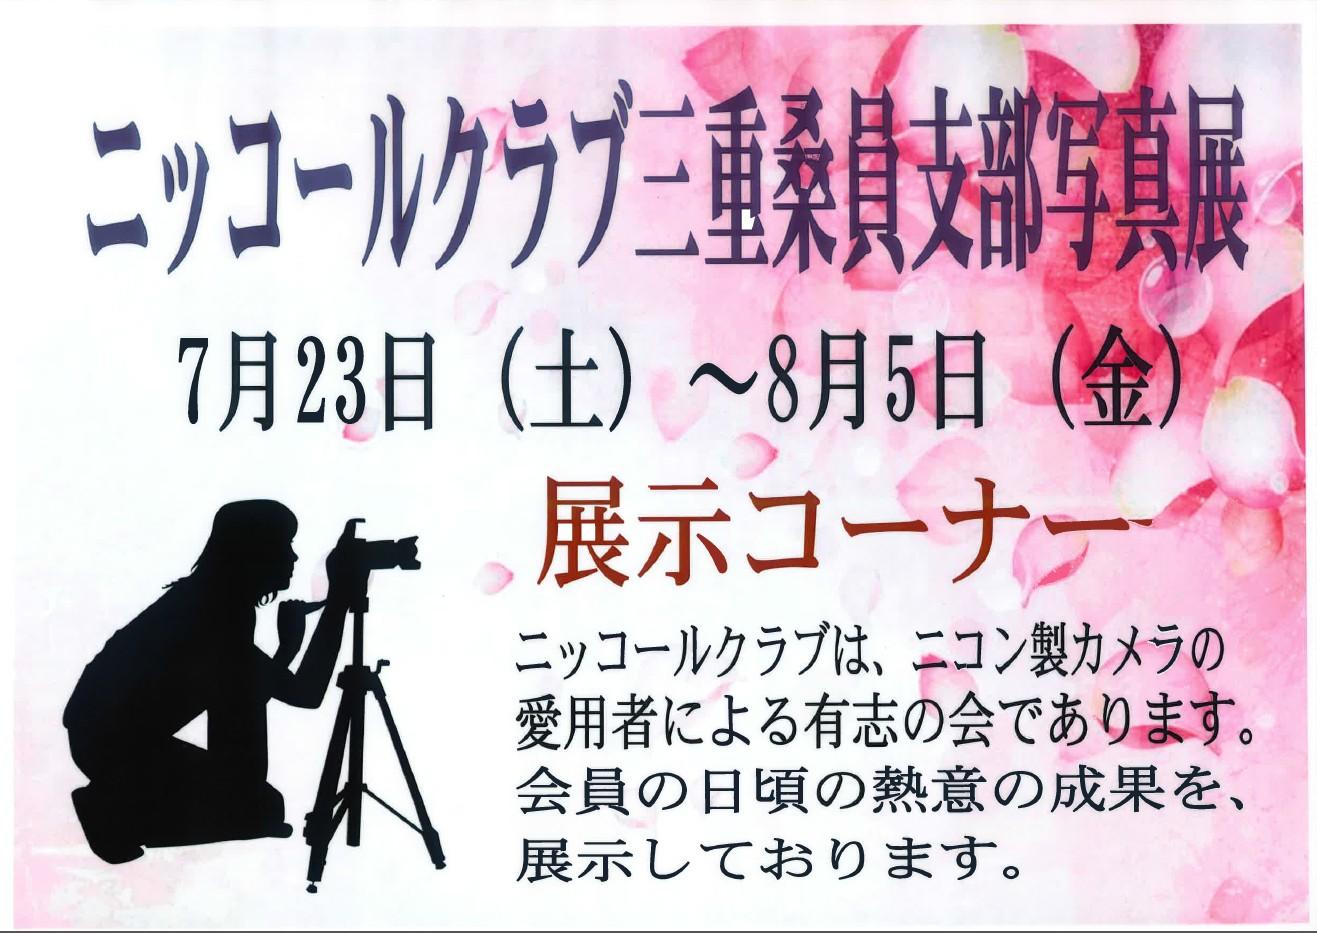 http://www.ajisainosato.com/info/images/2016y07m23d_150112618.jpg